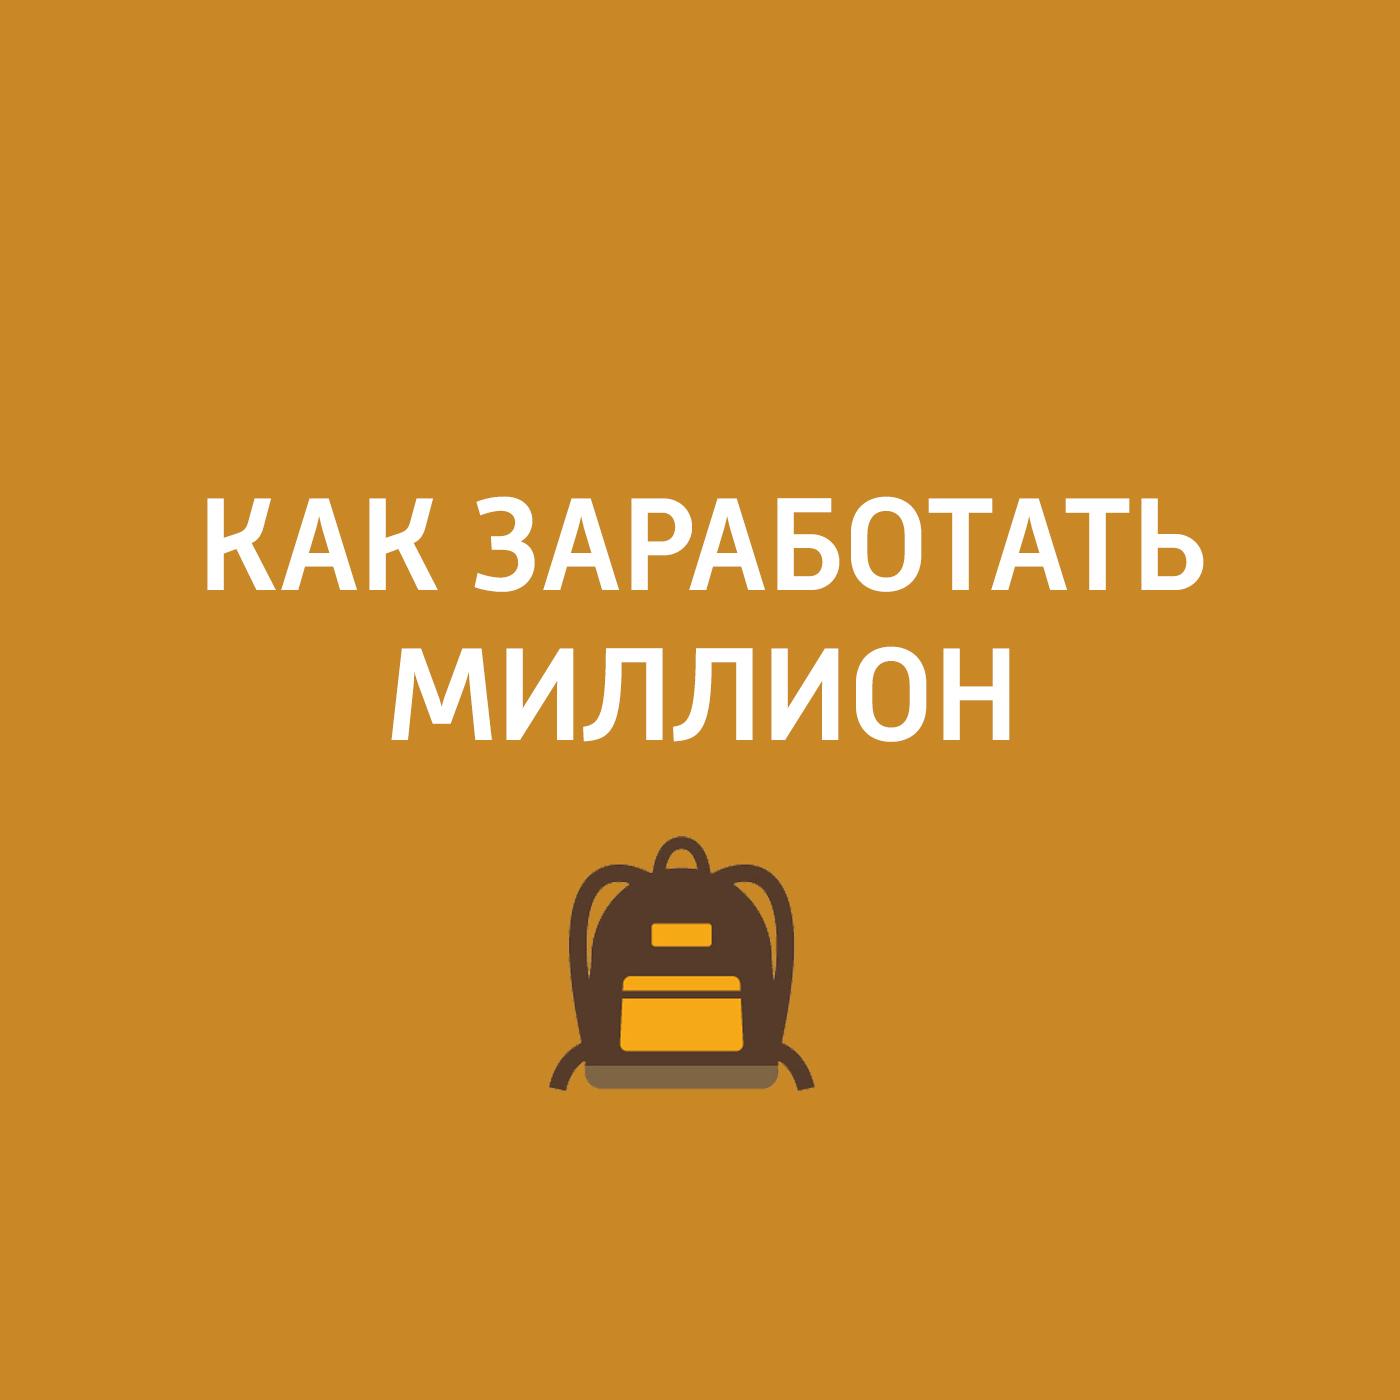 Творческий коллектив шоу «Сергей Стиллавин и его друзья» LavkaLavka